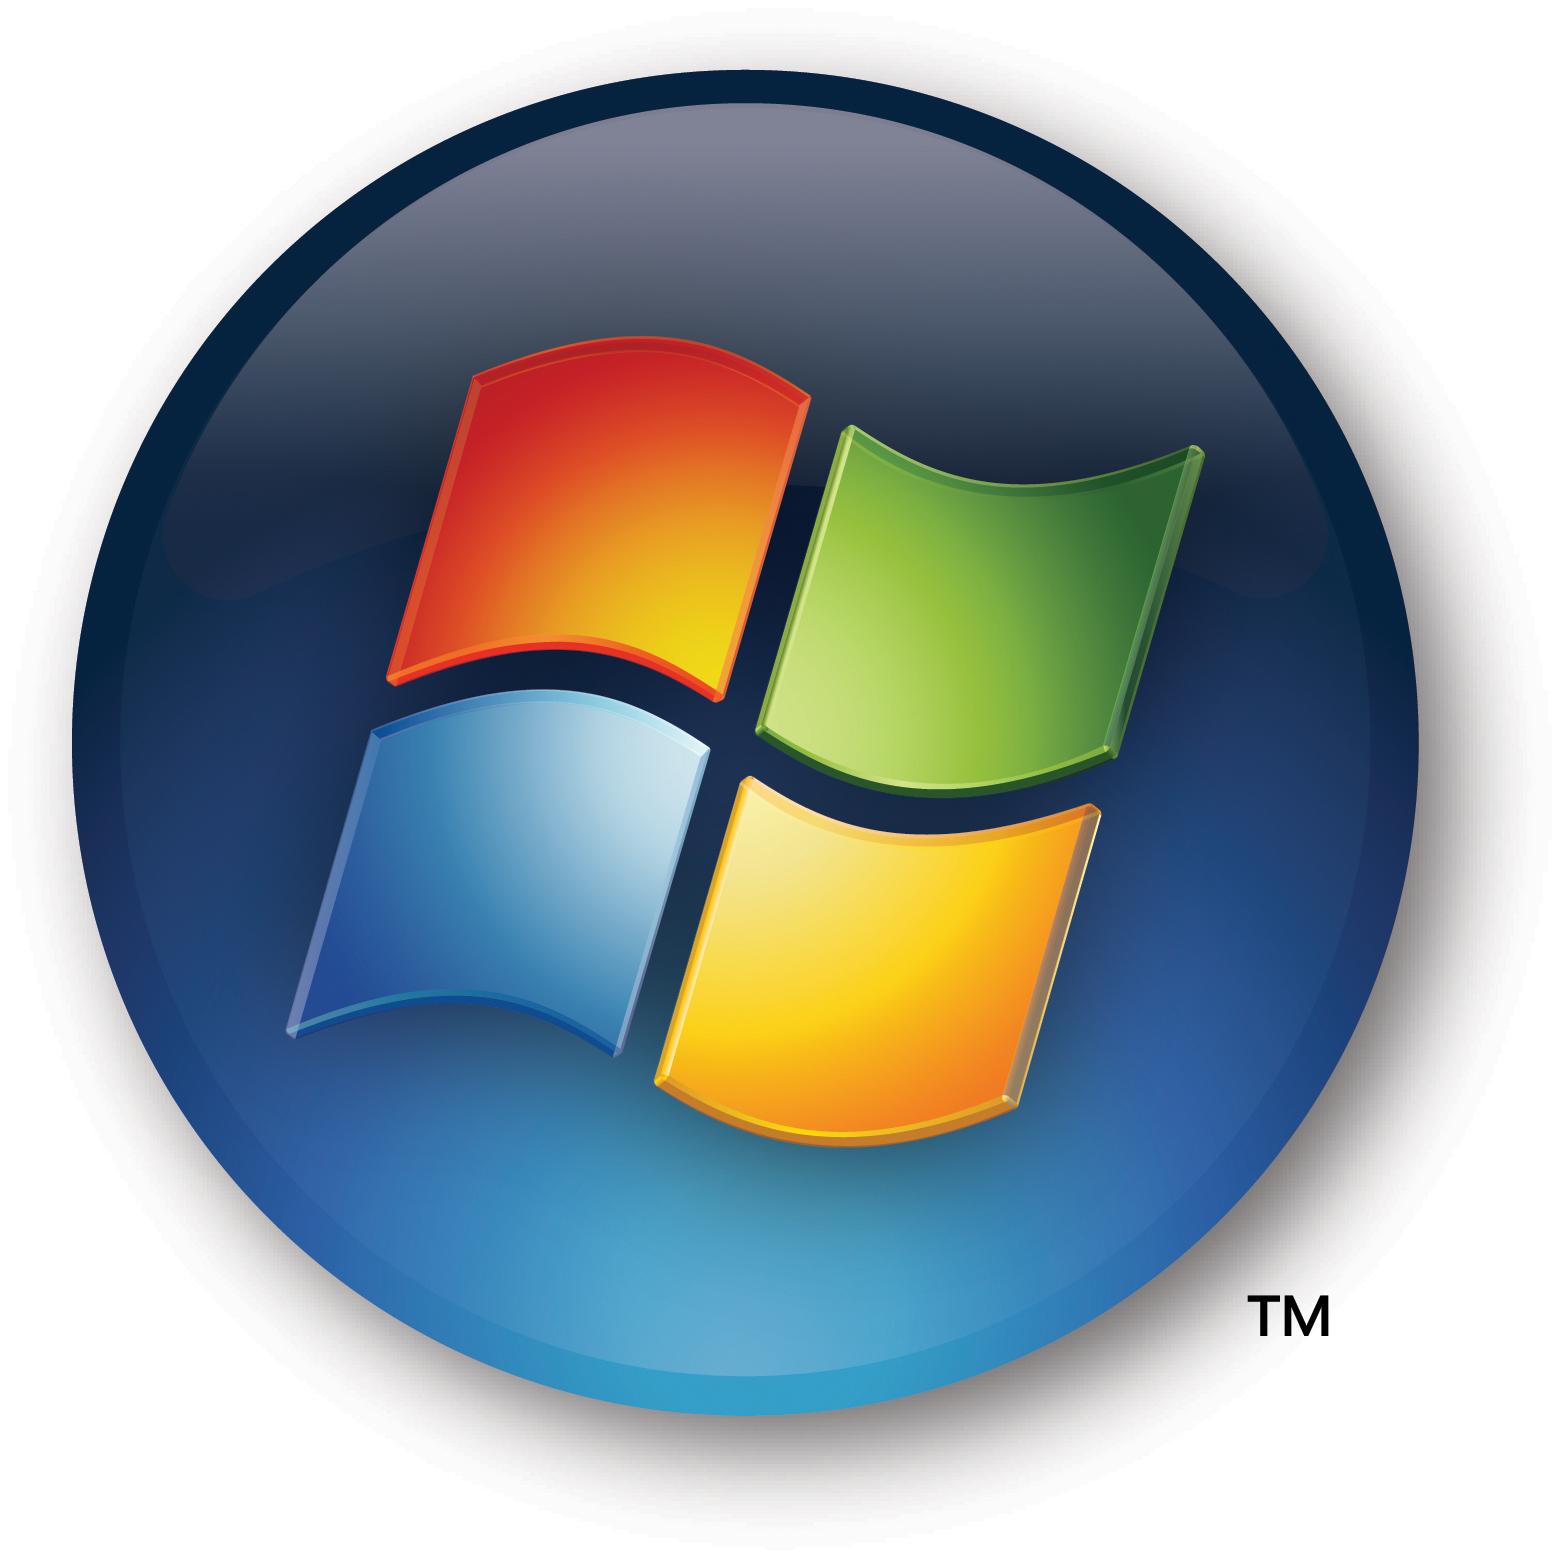 http://2.bp.blogspot.com/-9anBm60-dAo/TxJEzBN9i_I/AAAAAAAACrc/NeTB18Uqovw/s1600/Windows%20Vista%20Buttonrgb%20Wallpapers.jpg